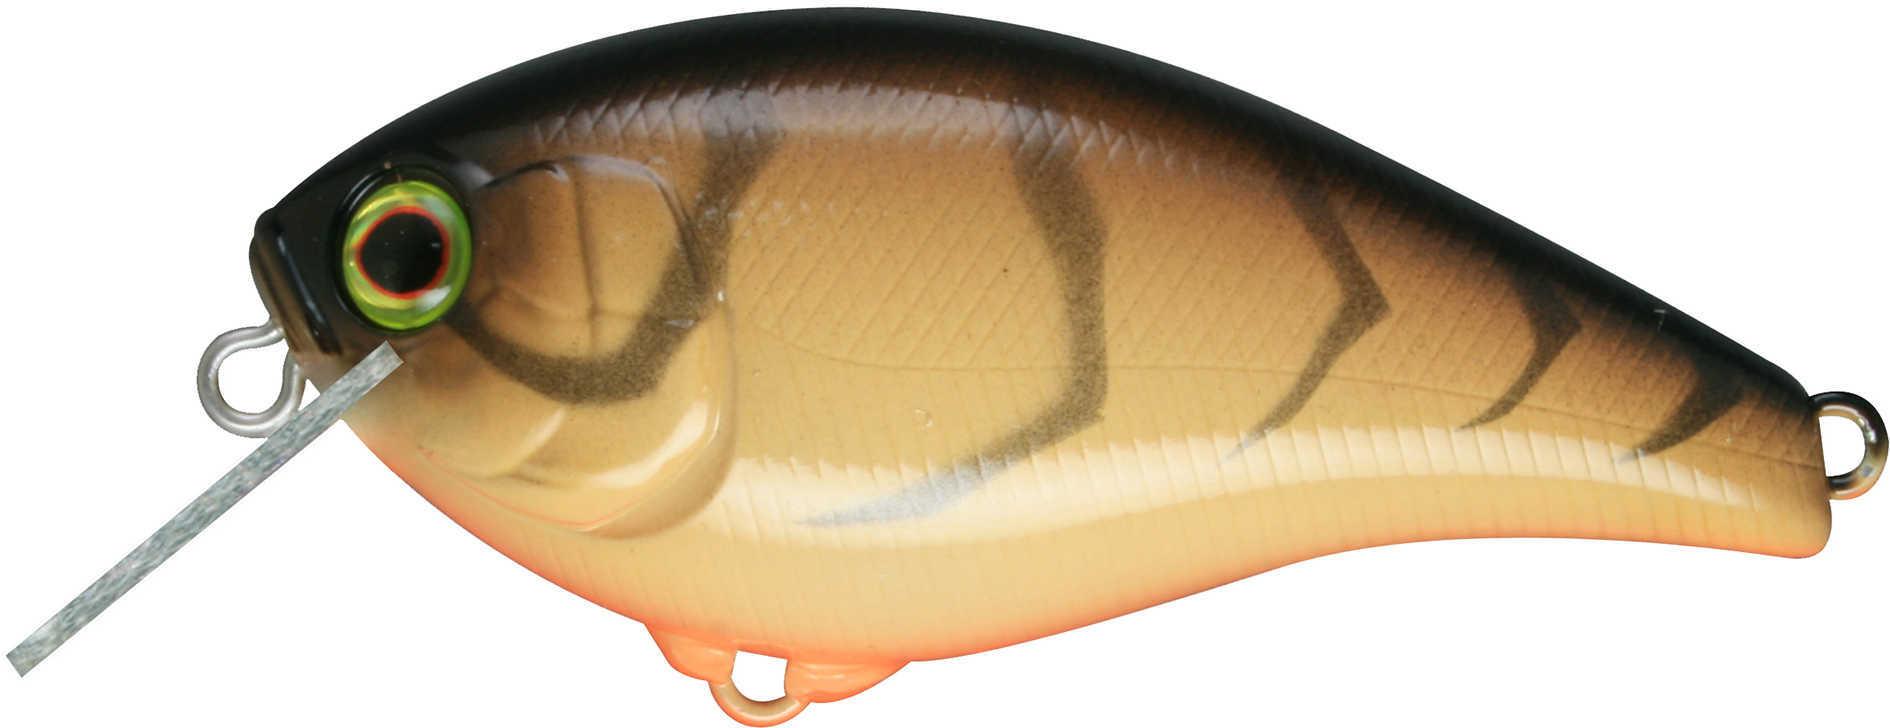 "Jackall Lures Aska60 SR Hard Crank Bait Lure 2 1/2"" Body Length, 4' Depth, 3/8 oz, Super Crawfish, Per 1 Md: JASK60SR-SC"